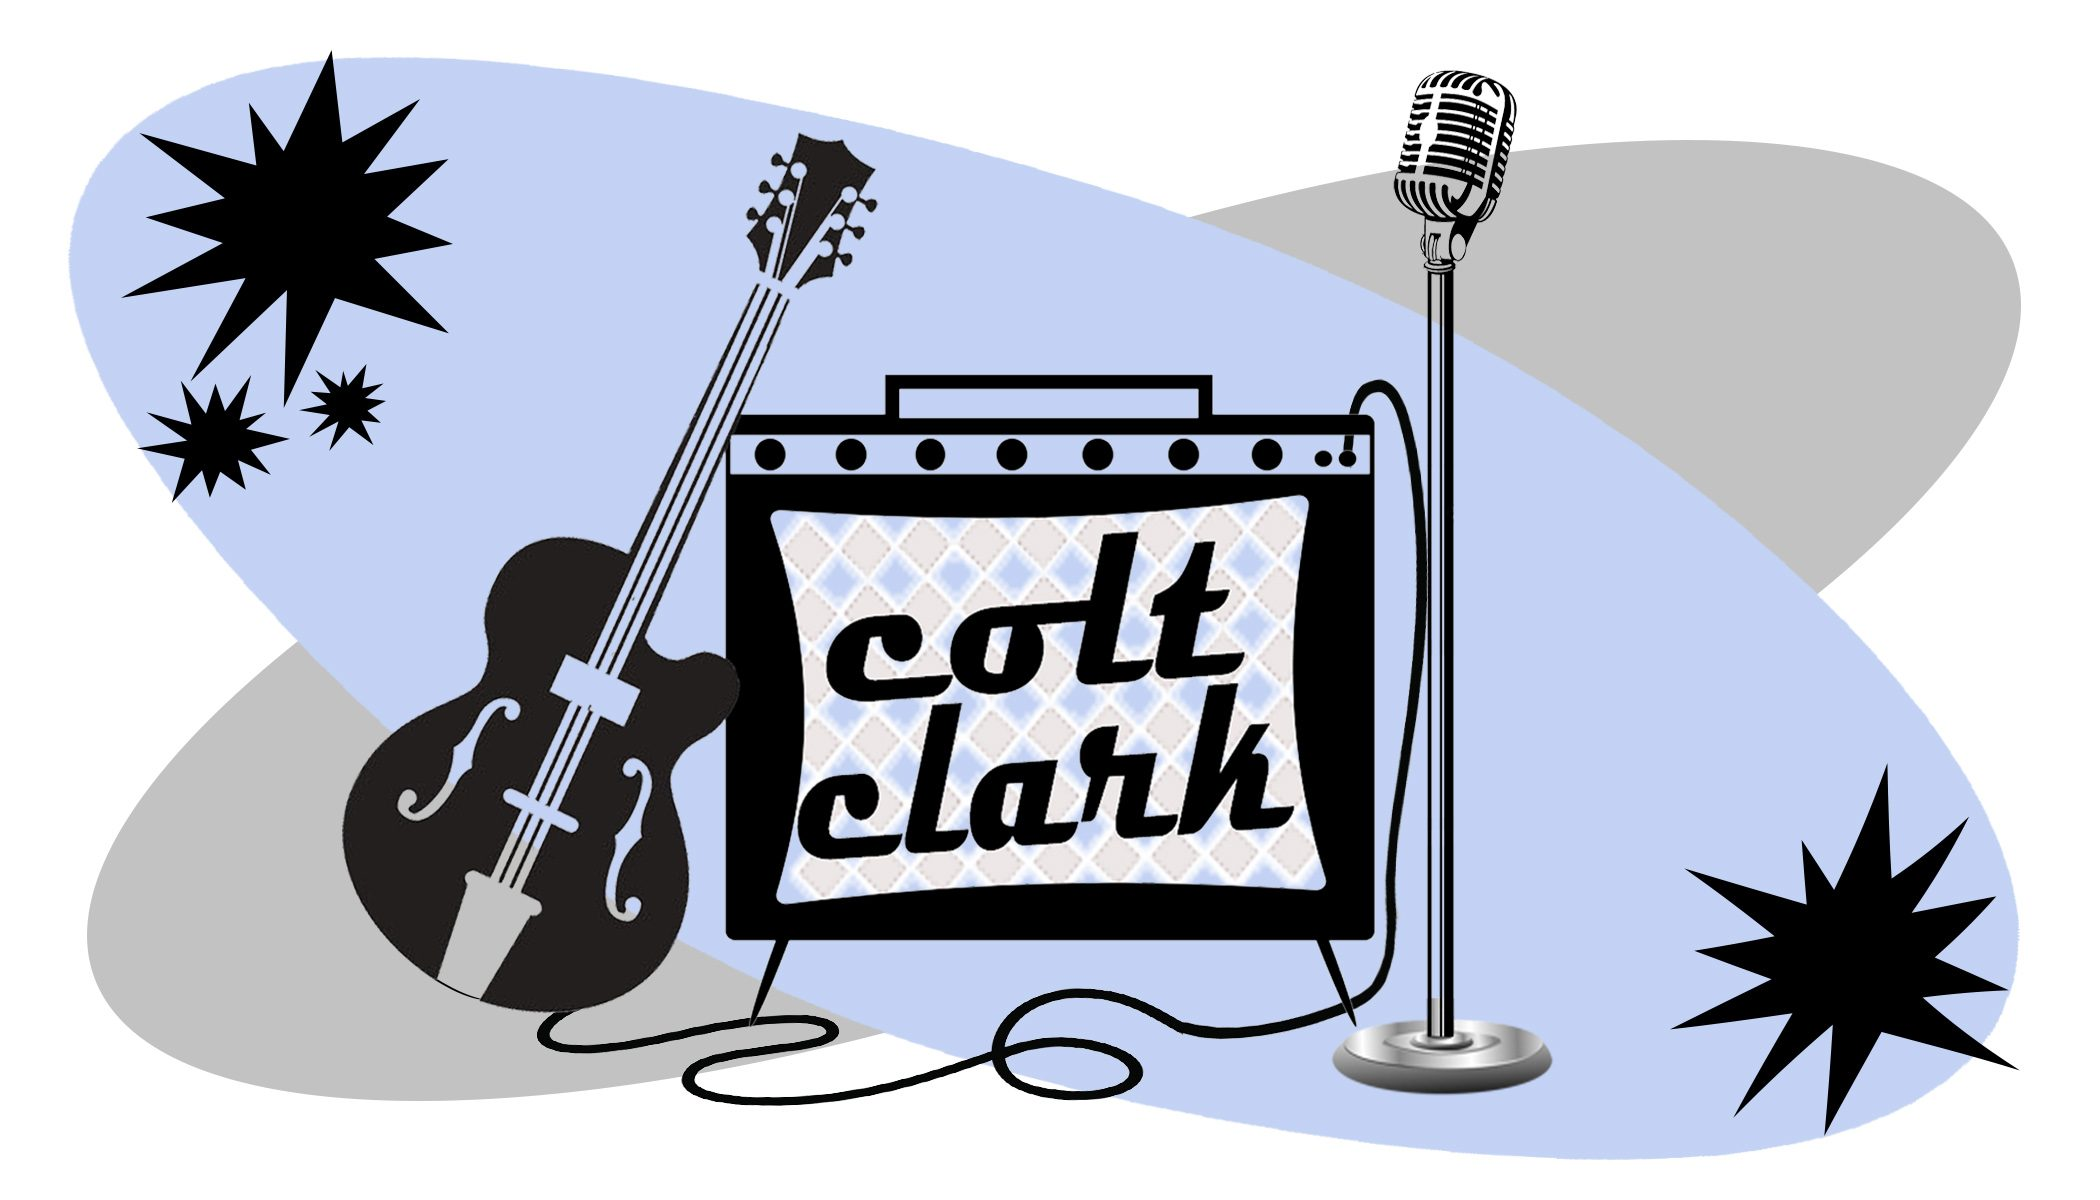 COLT CLARK MUSIC